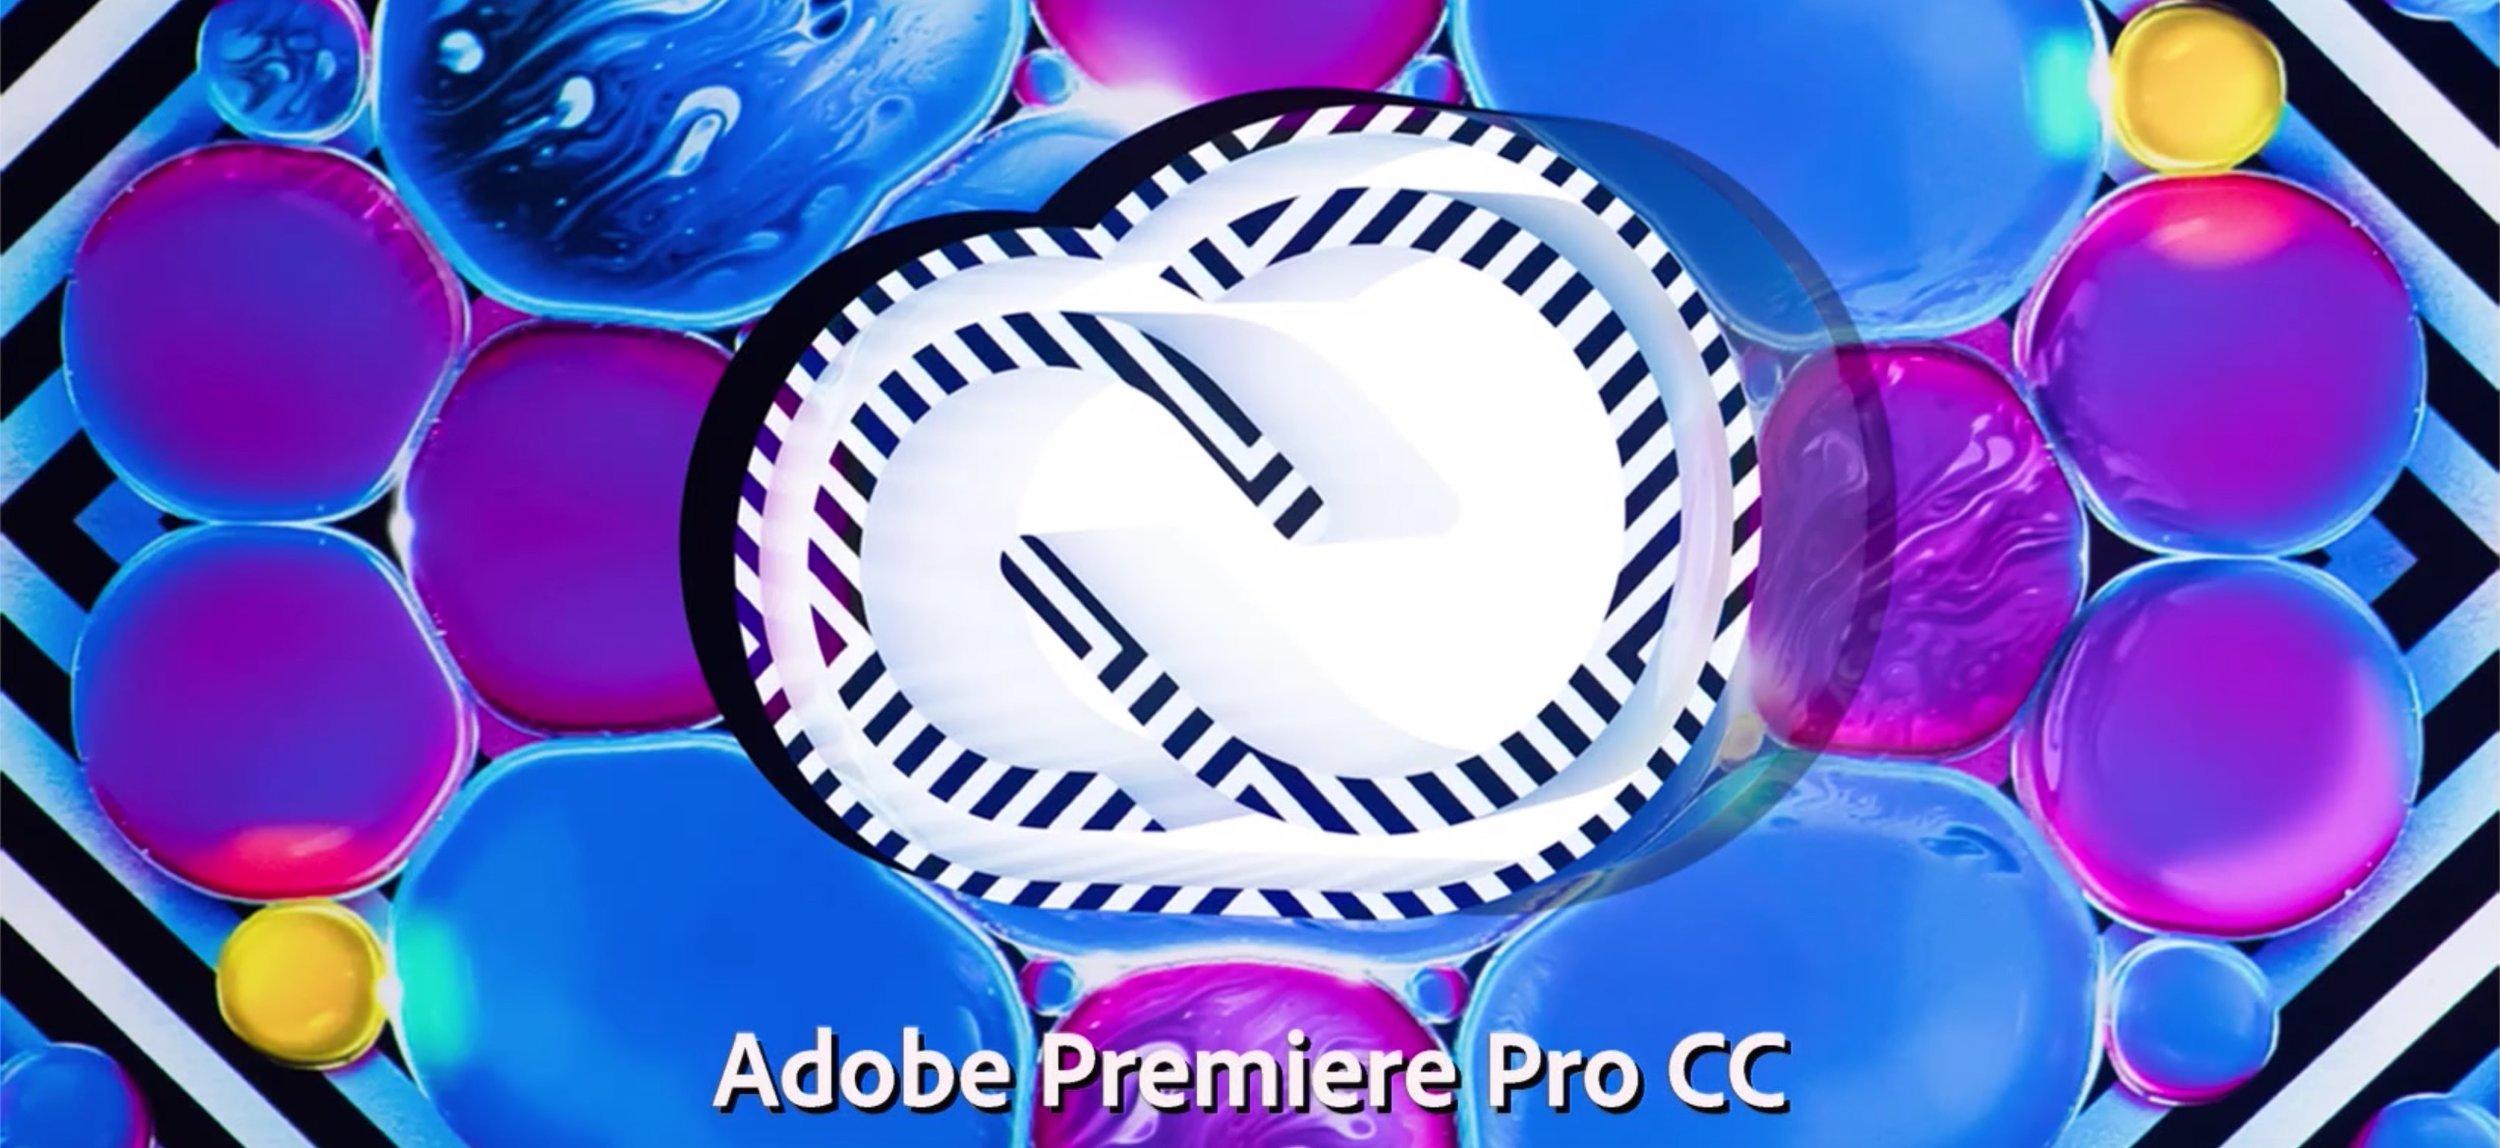 premiere-pro-ibc-2016